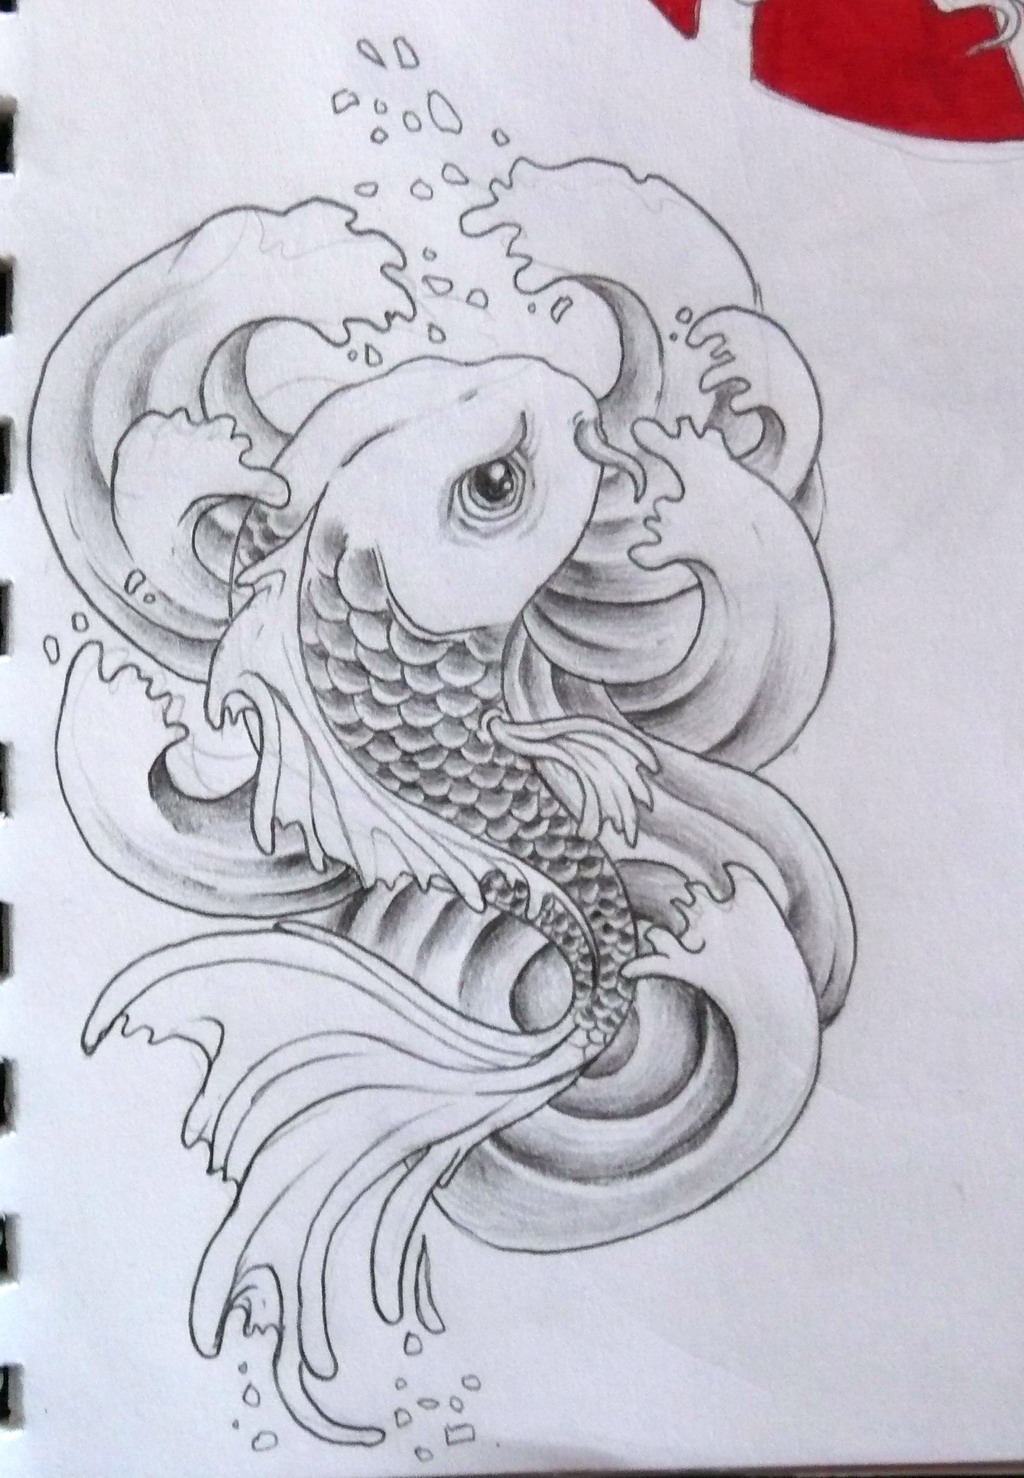 Koi fish 01 by zioman on deviantart for Koi fish design